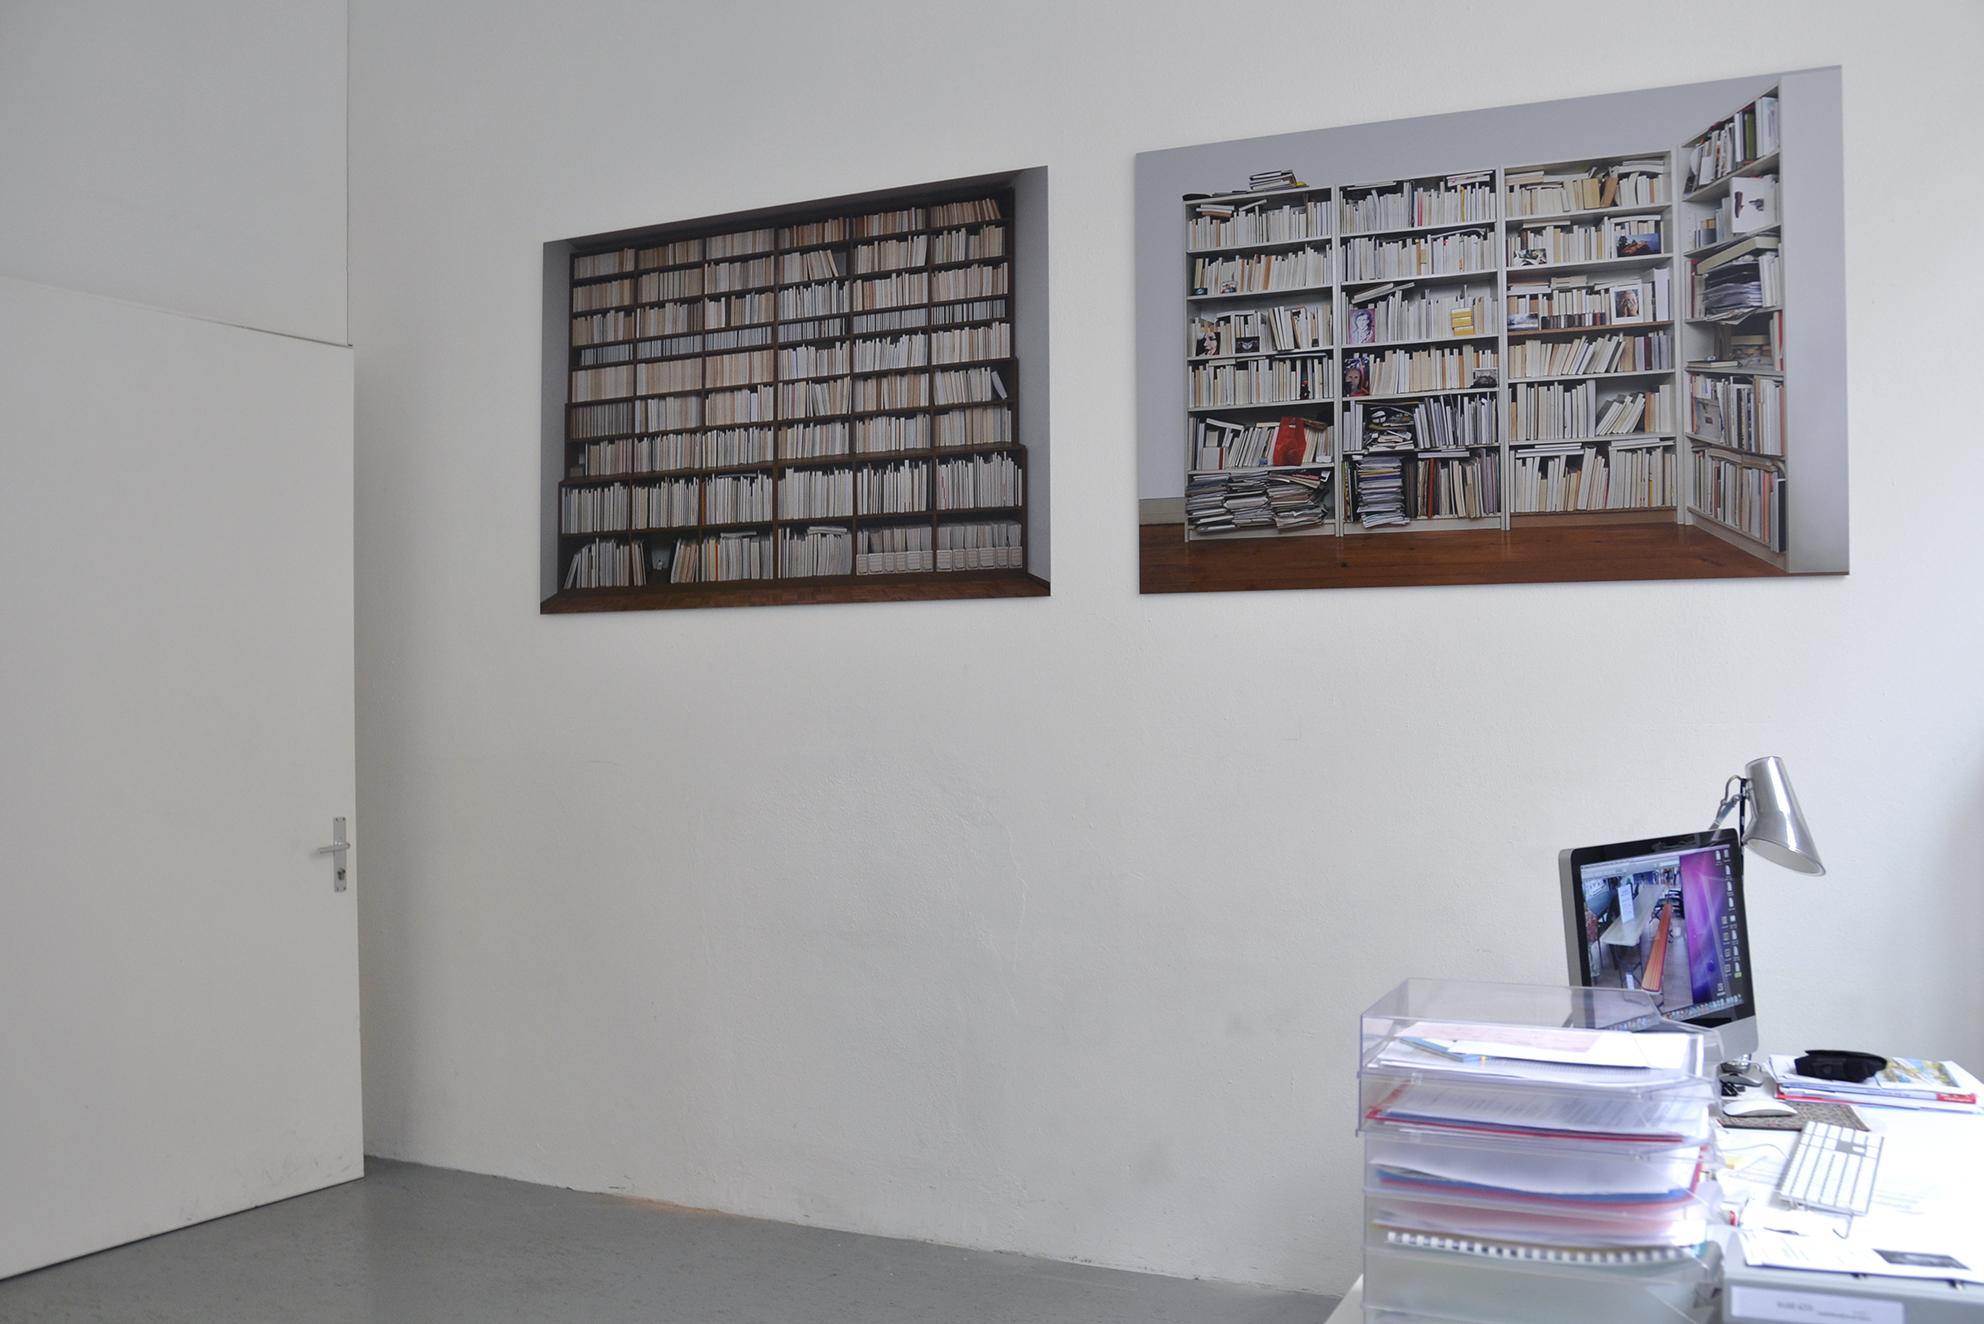 Bookshelf, series of 2 photographs, Inkjet / aluminum printing, 110 x 160 cm, 2010